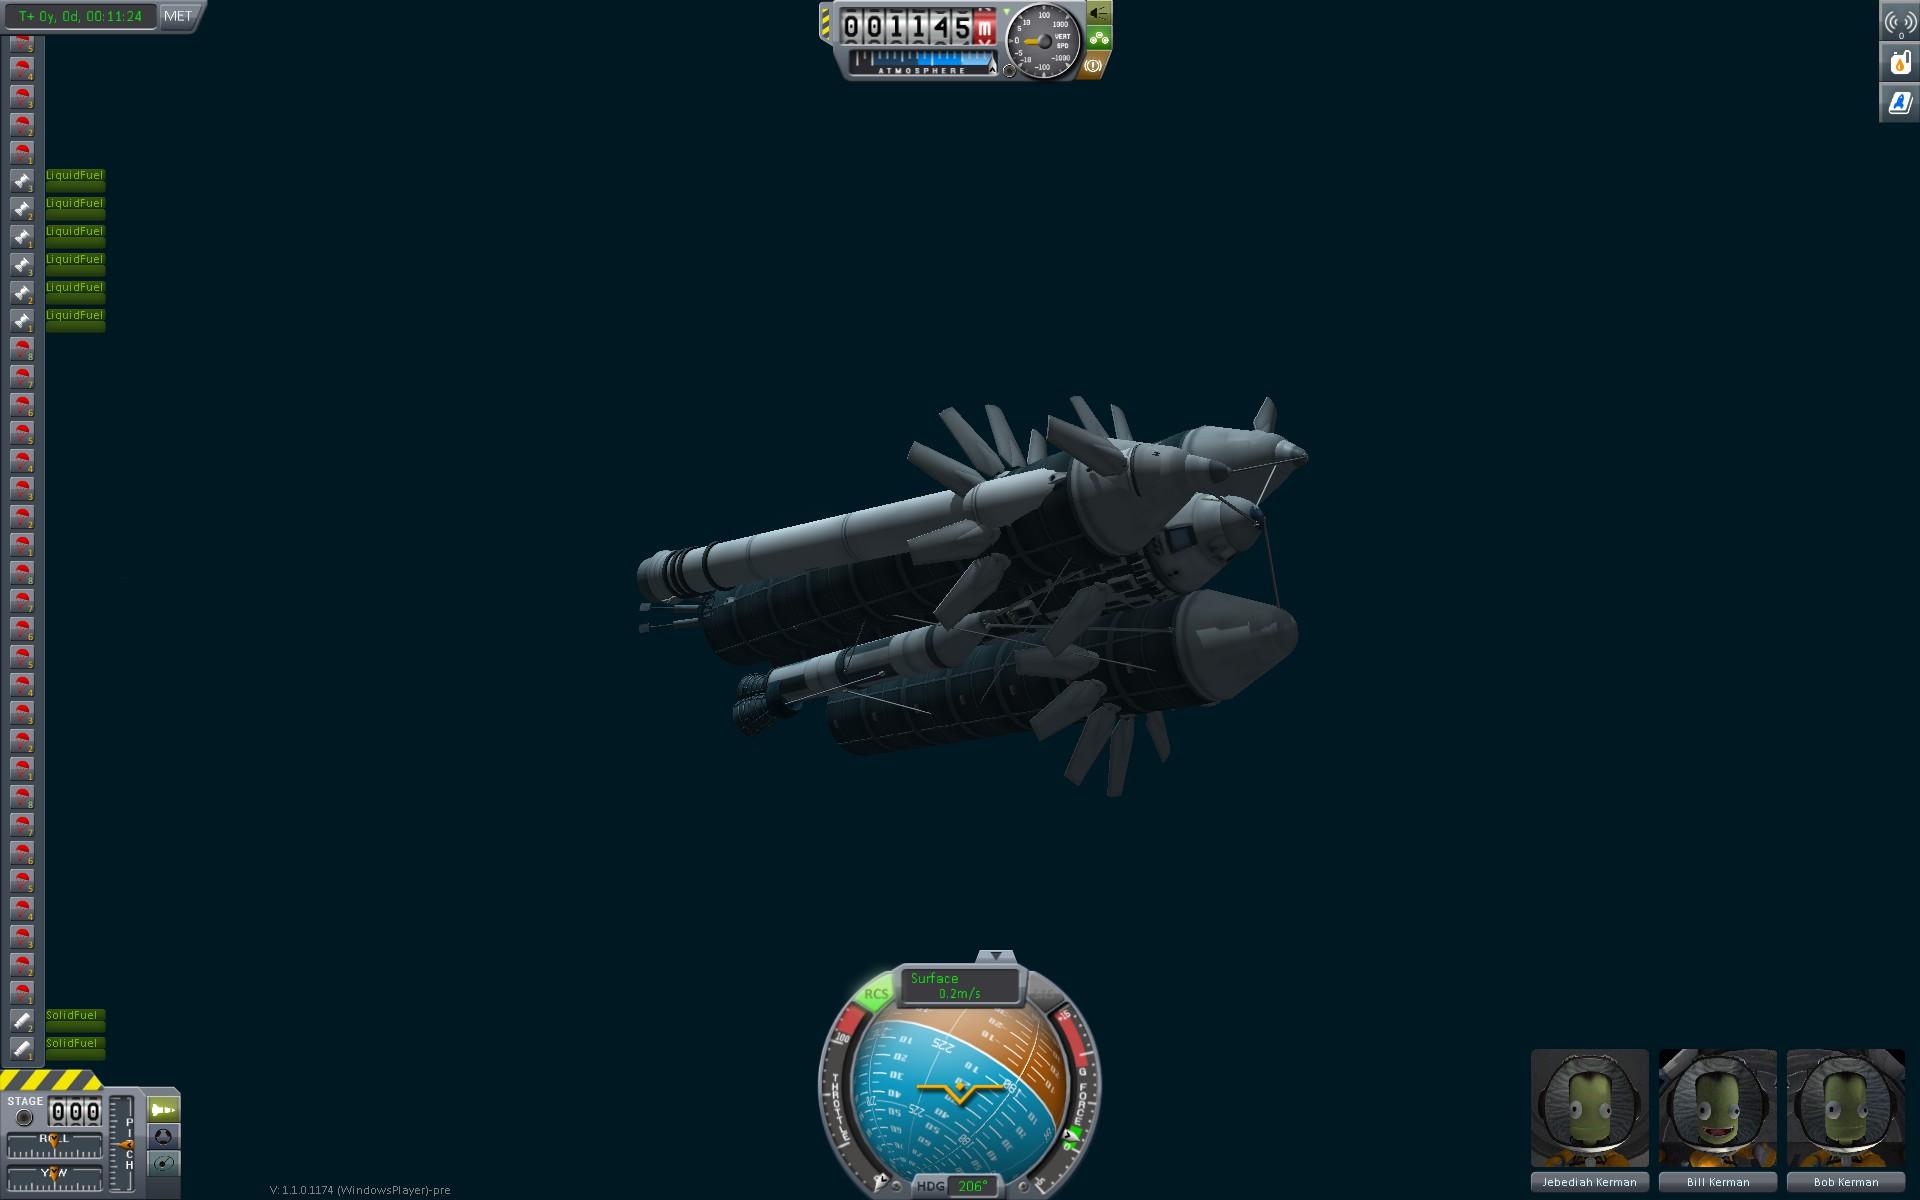 kerbal space program bugs - photo #3